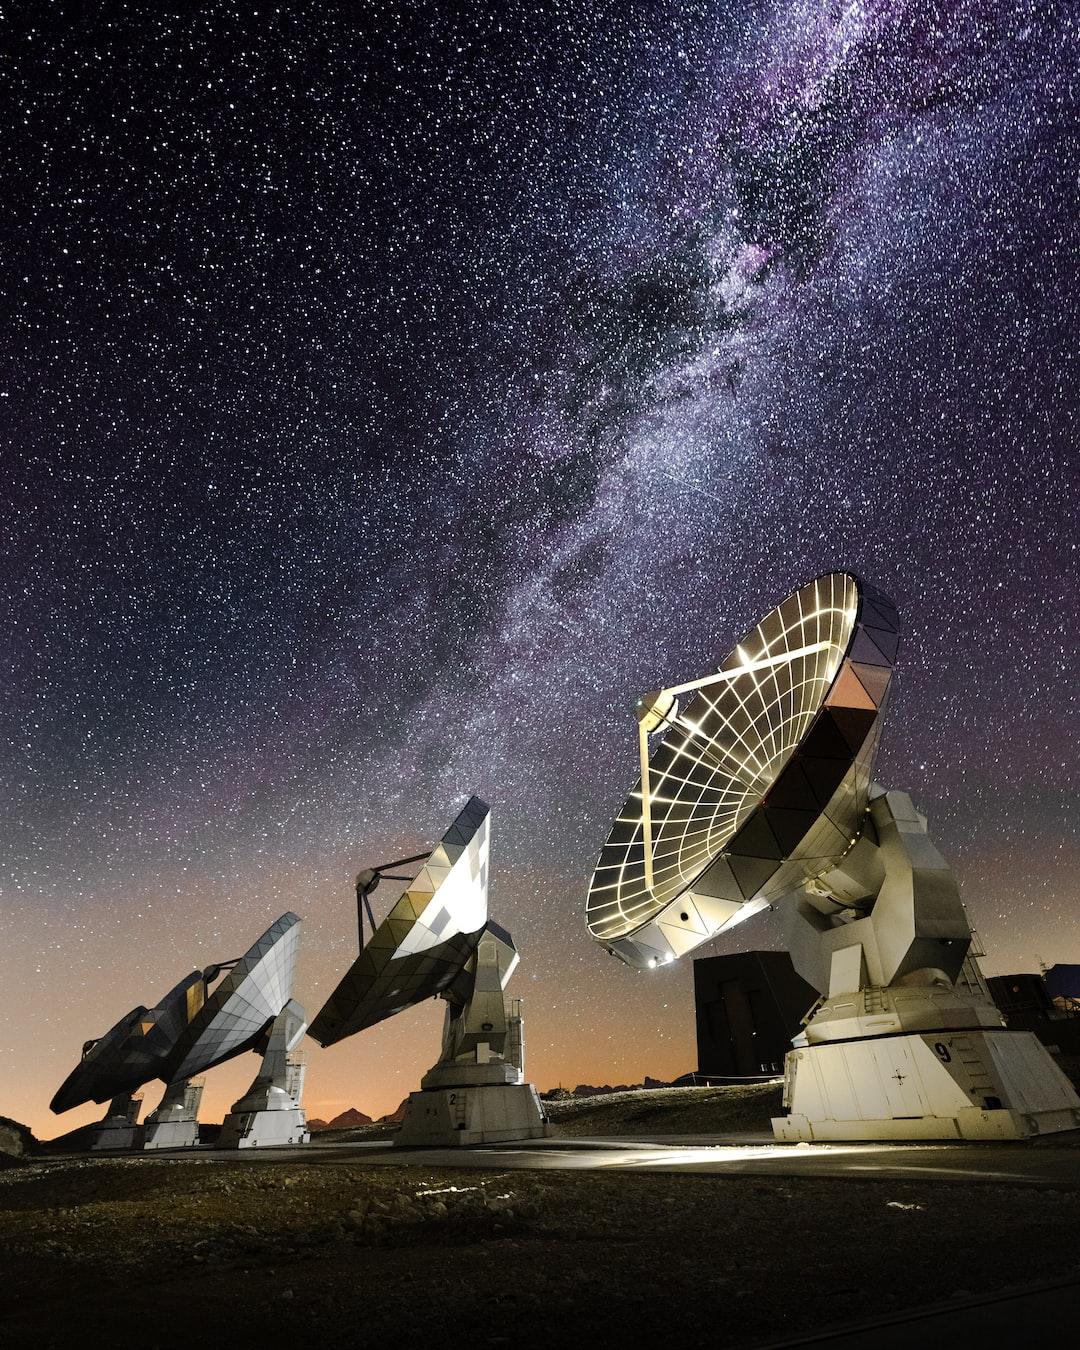 interferometers under the Milky Way